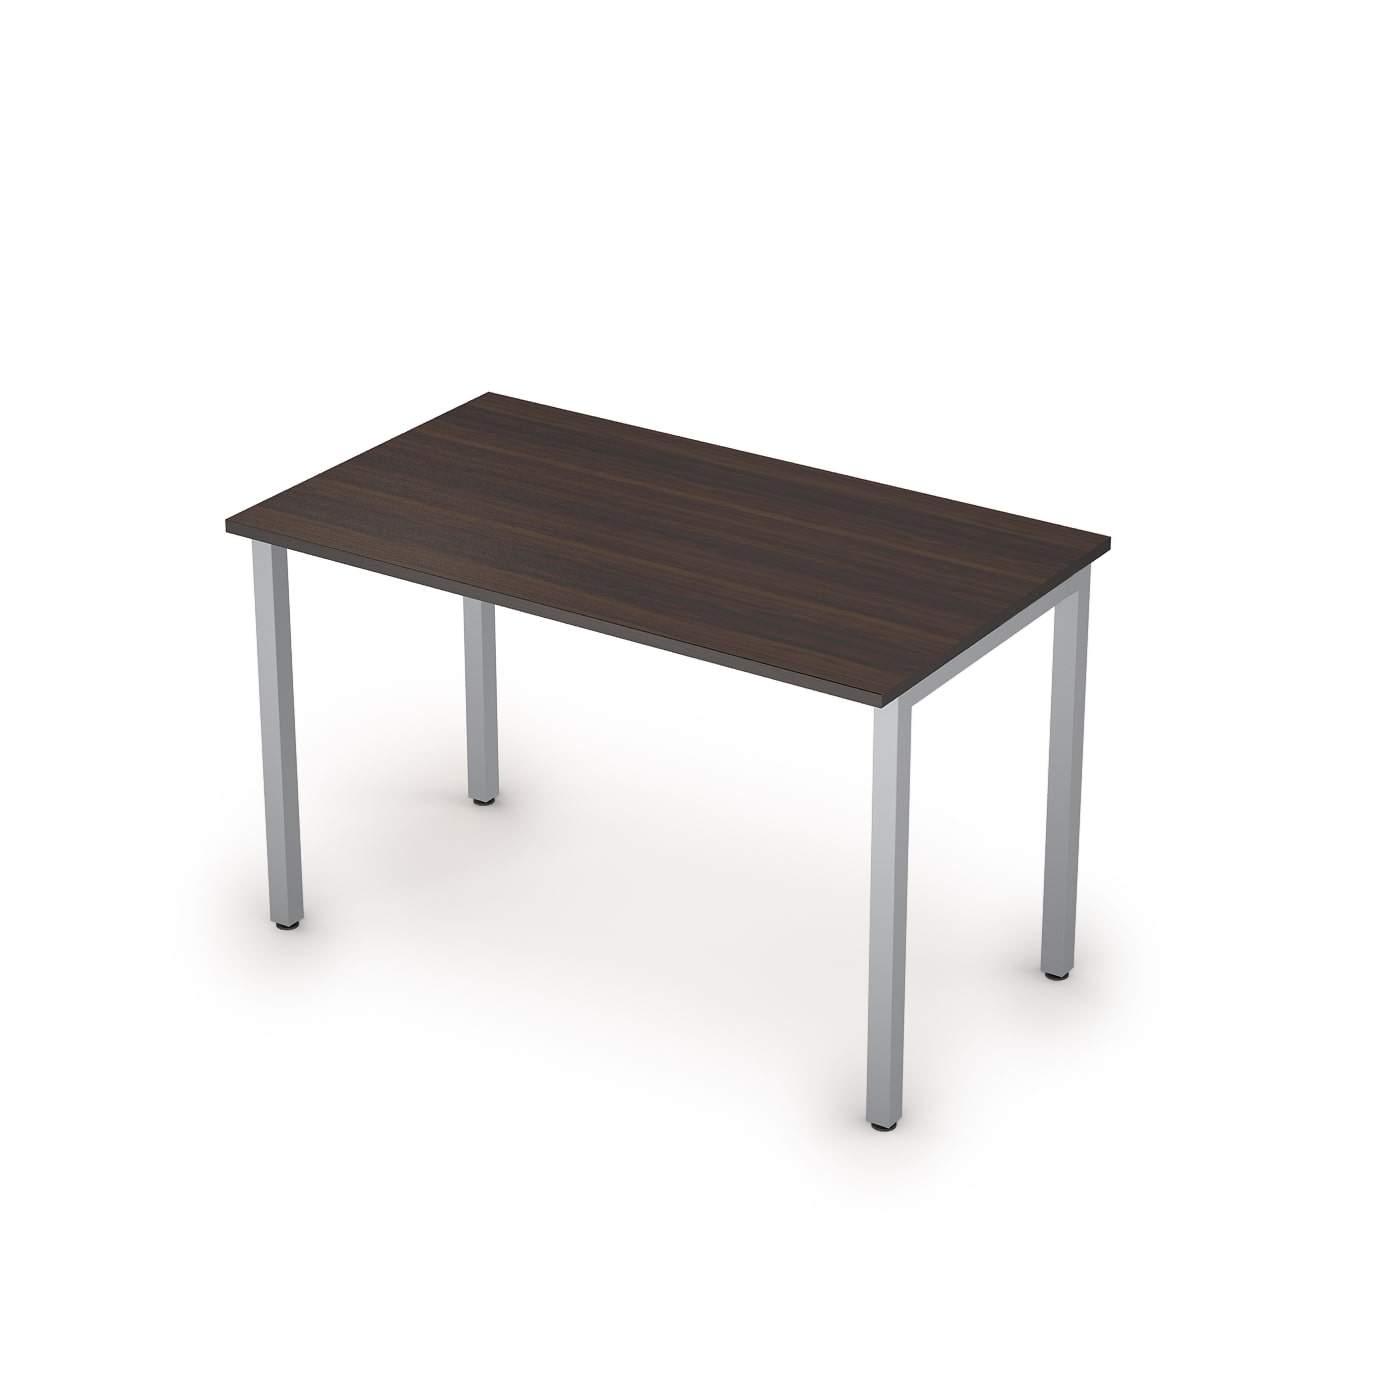 Столы на металлических опорах без экрана  1200х700х750